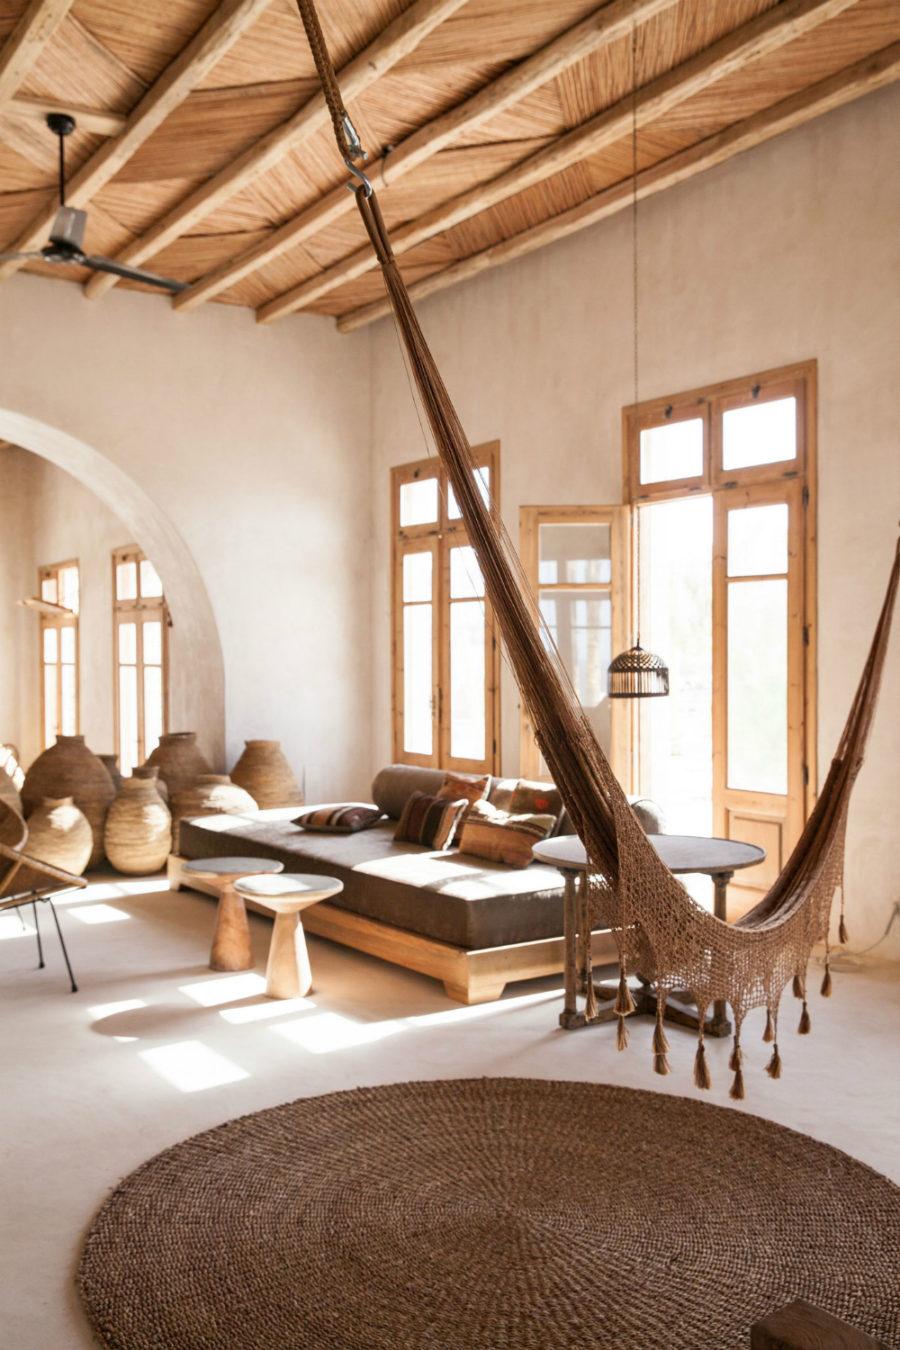 Rustic interior hammock